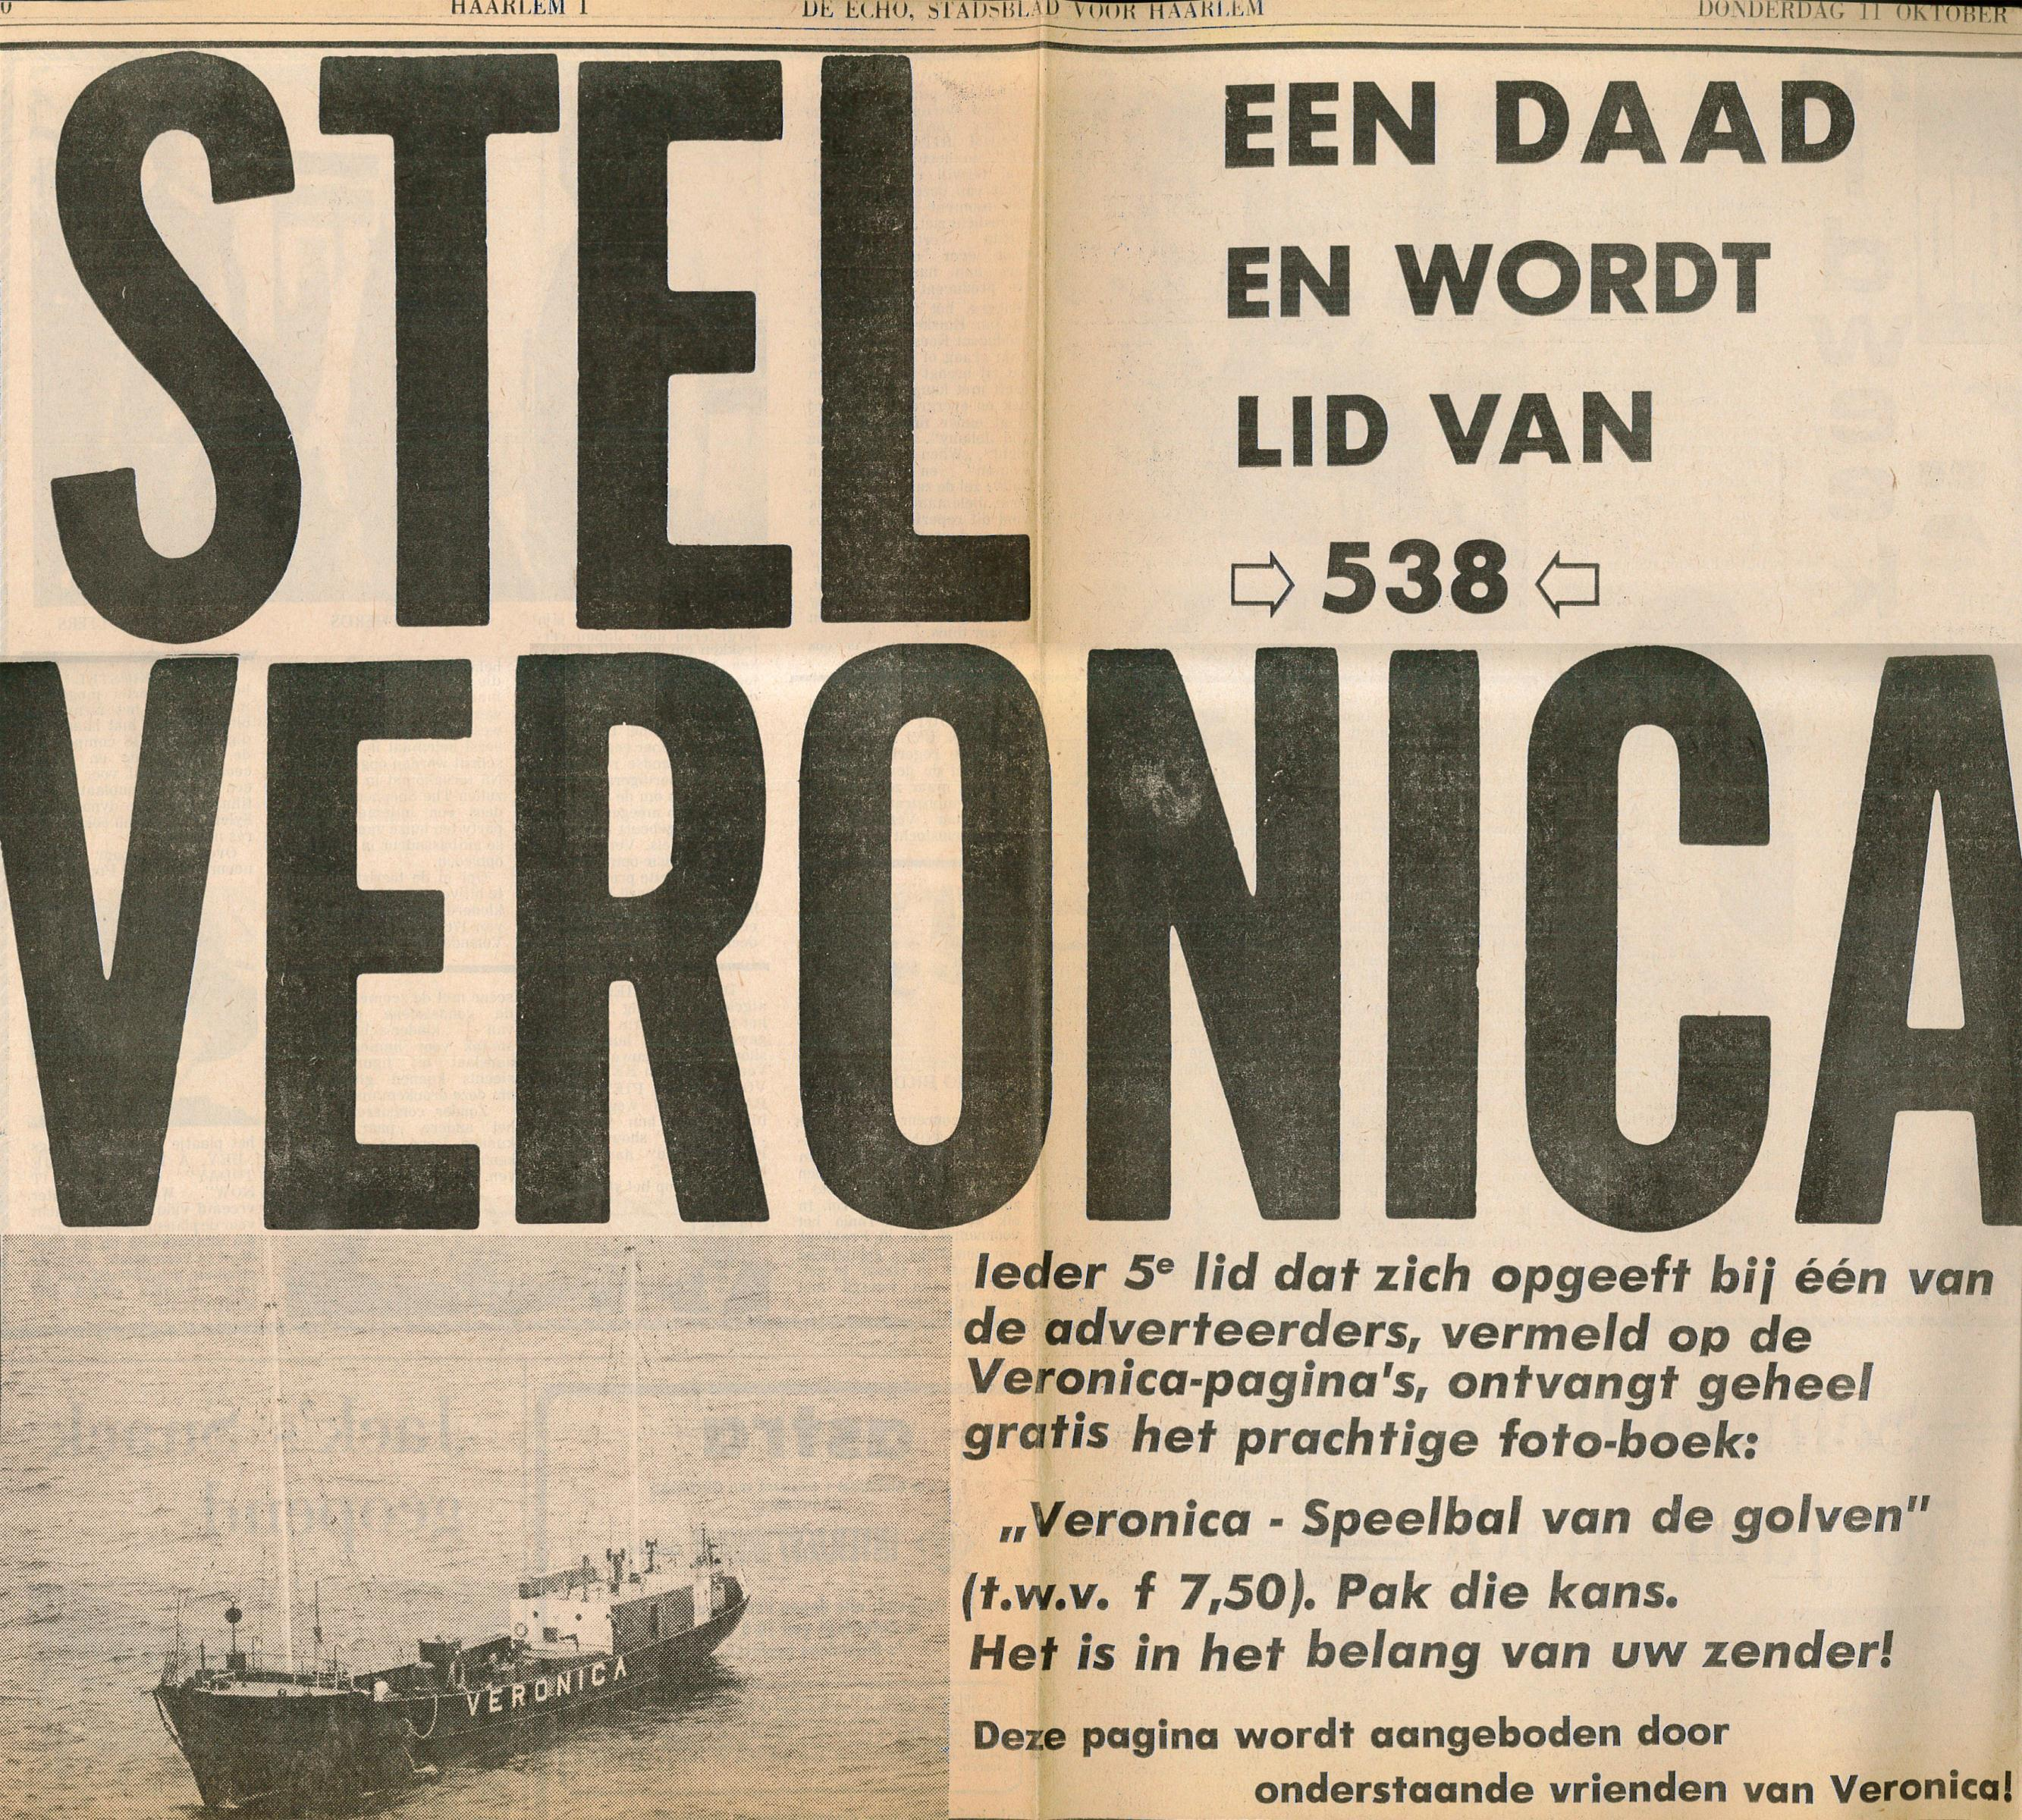 19731011 Stadblad Haarlem Stel een daad en wordt lid van 538 veronica.jpg